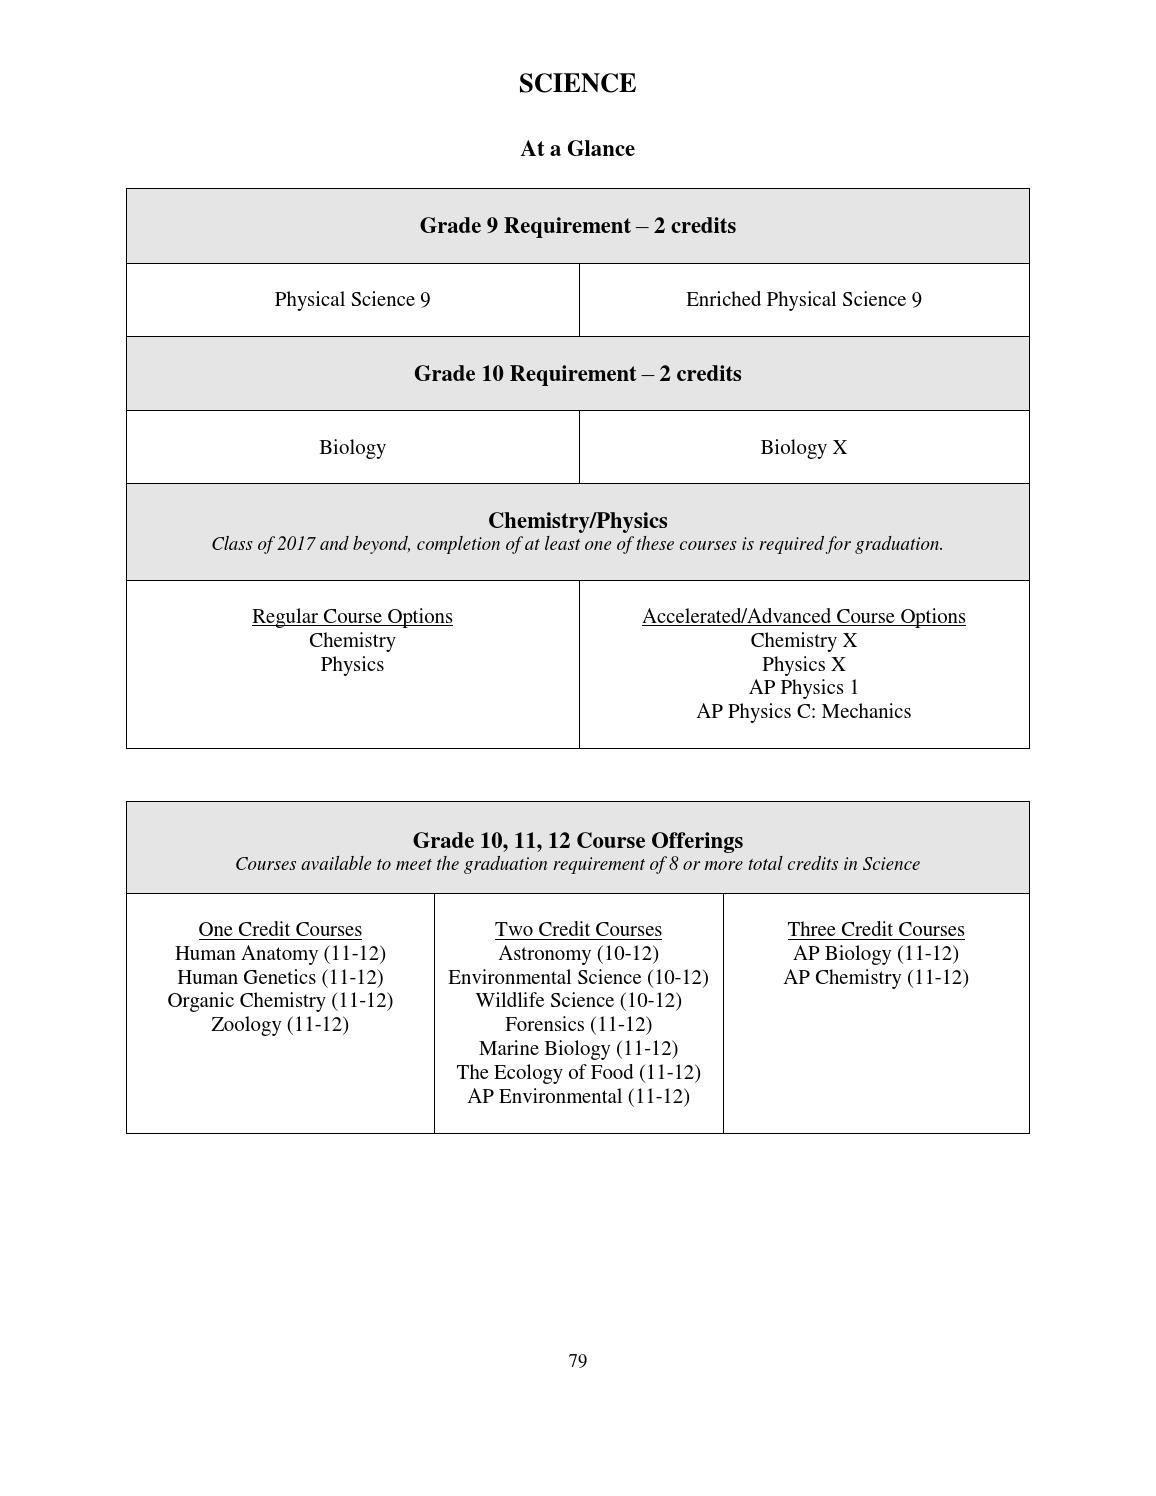 Wayzata High School Registration Guide 2016-2017 by Wayzata Public